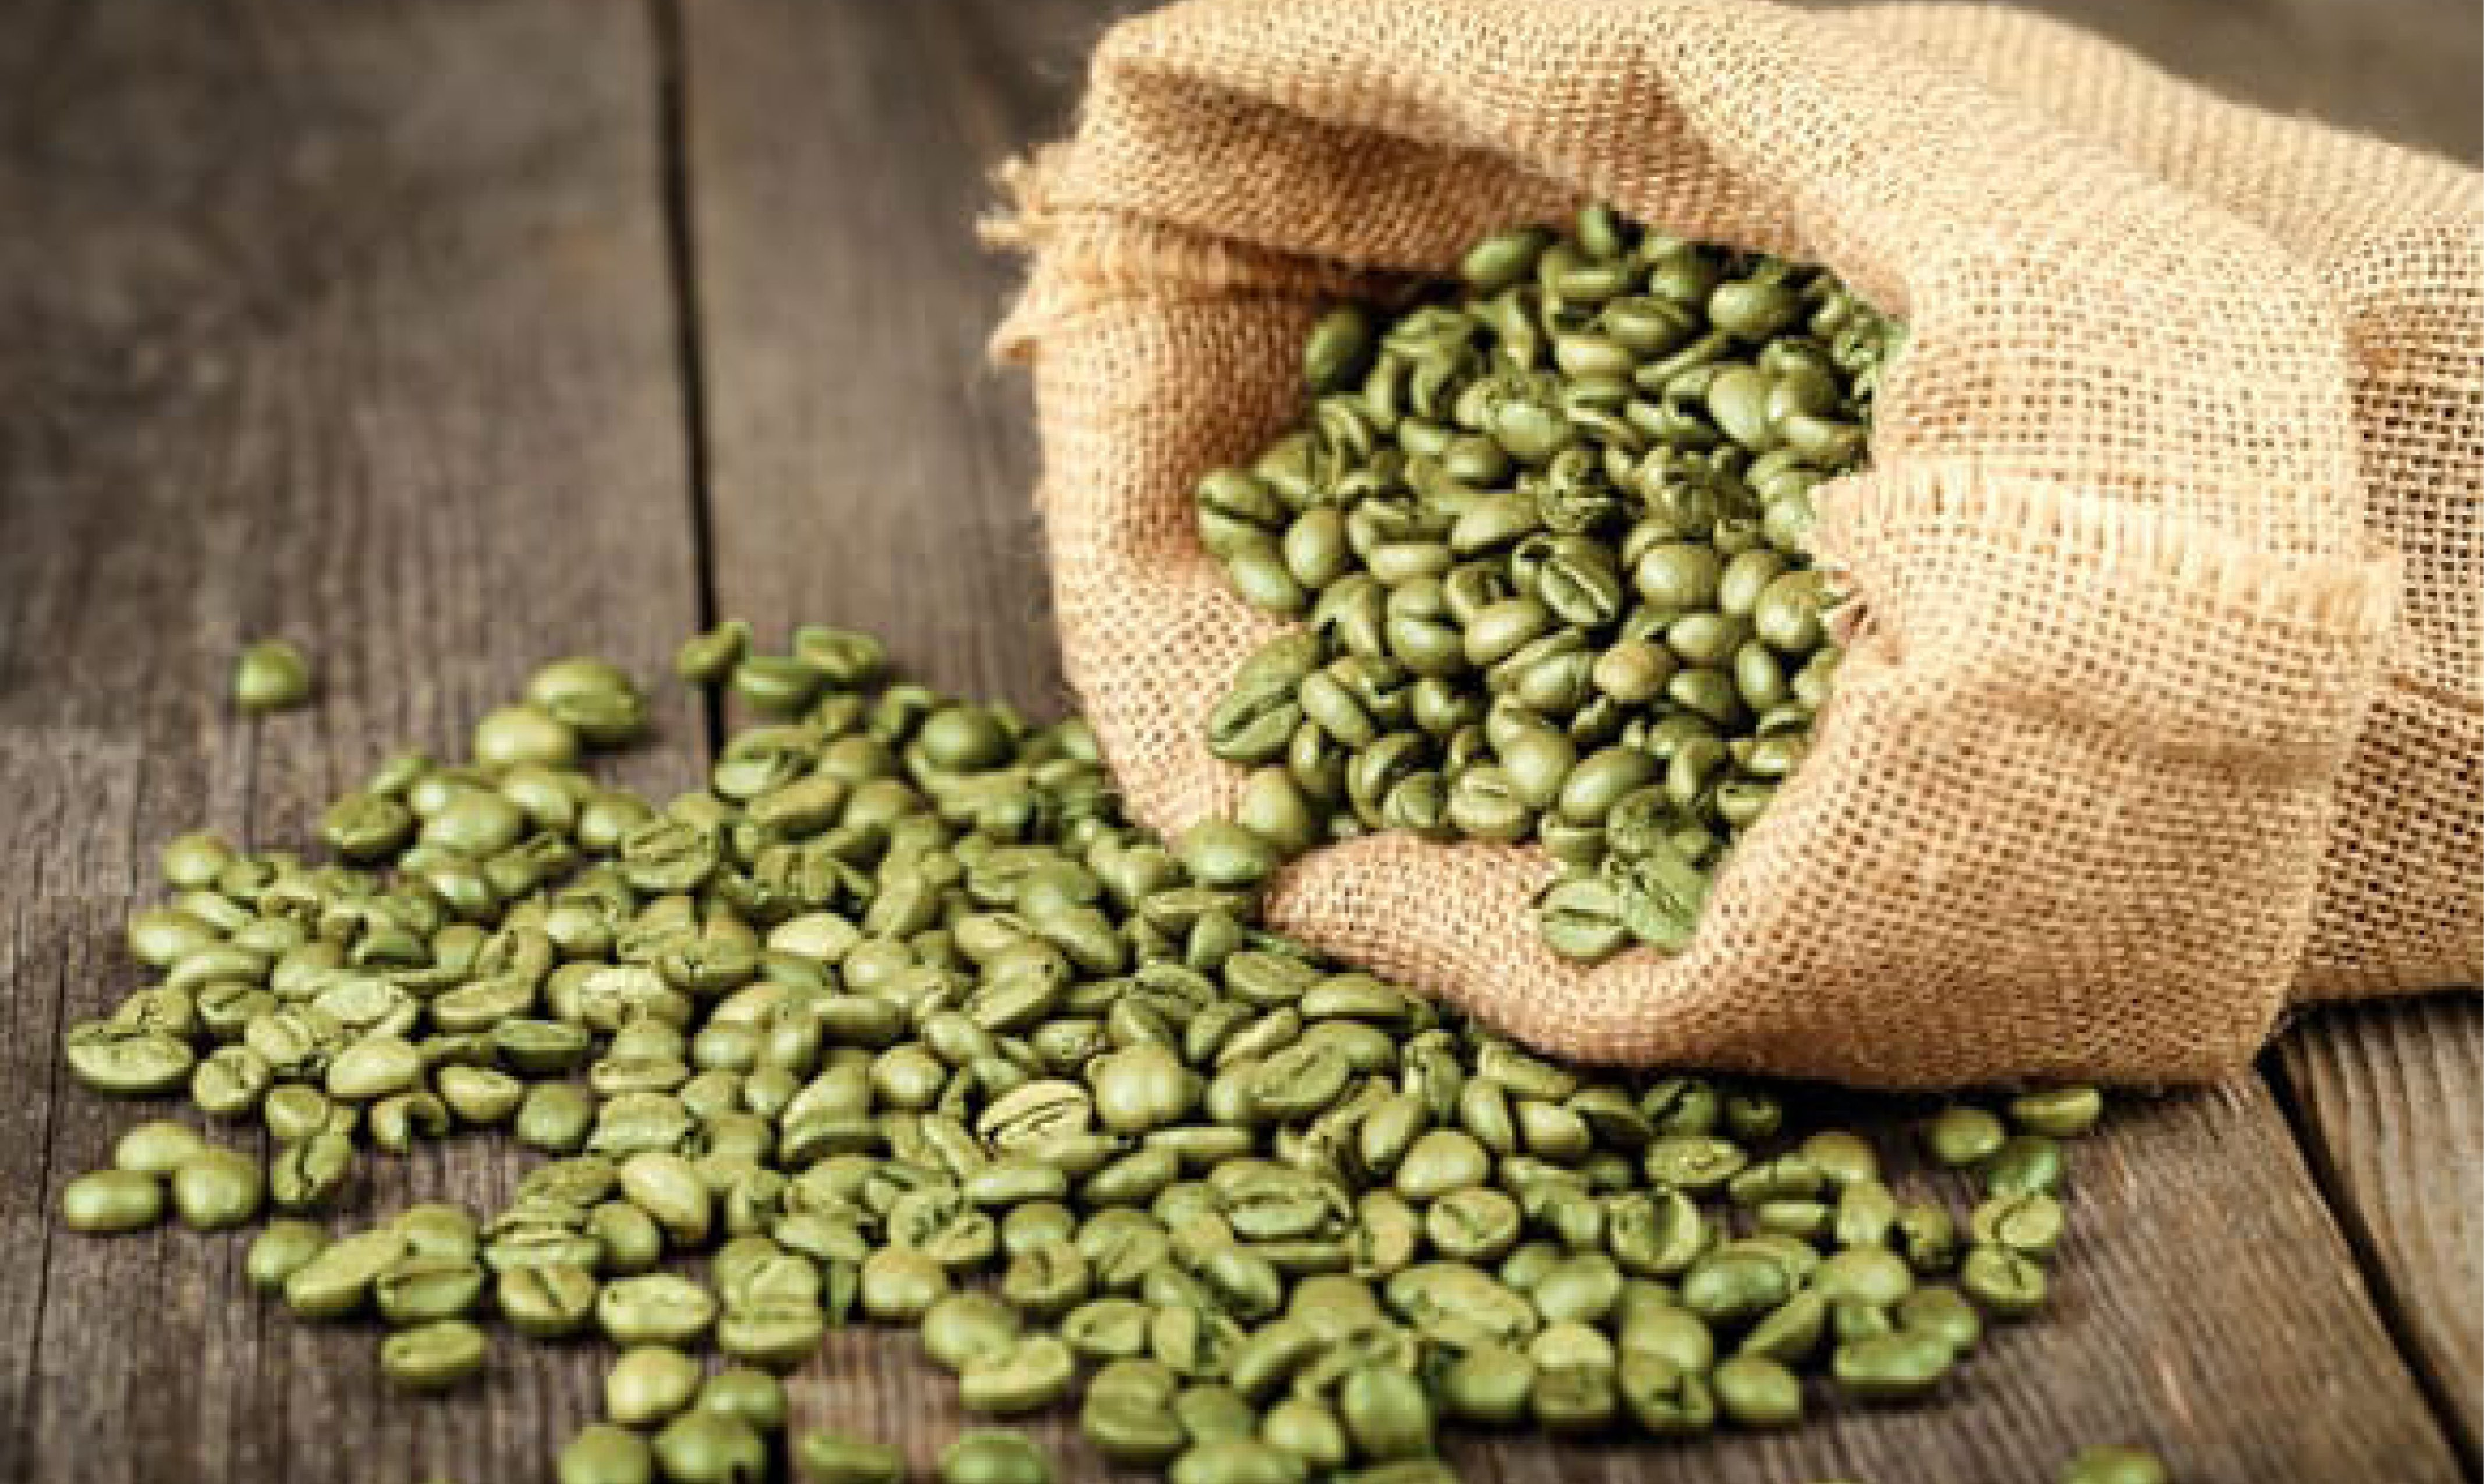 Green Coffee beans, green coffee benefits, Green coffee benefits for weight loss, Green coffee side effects